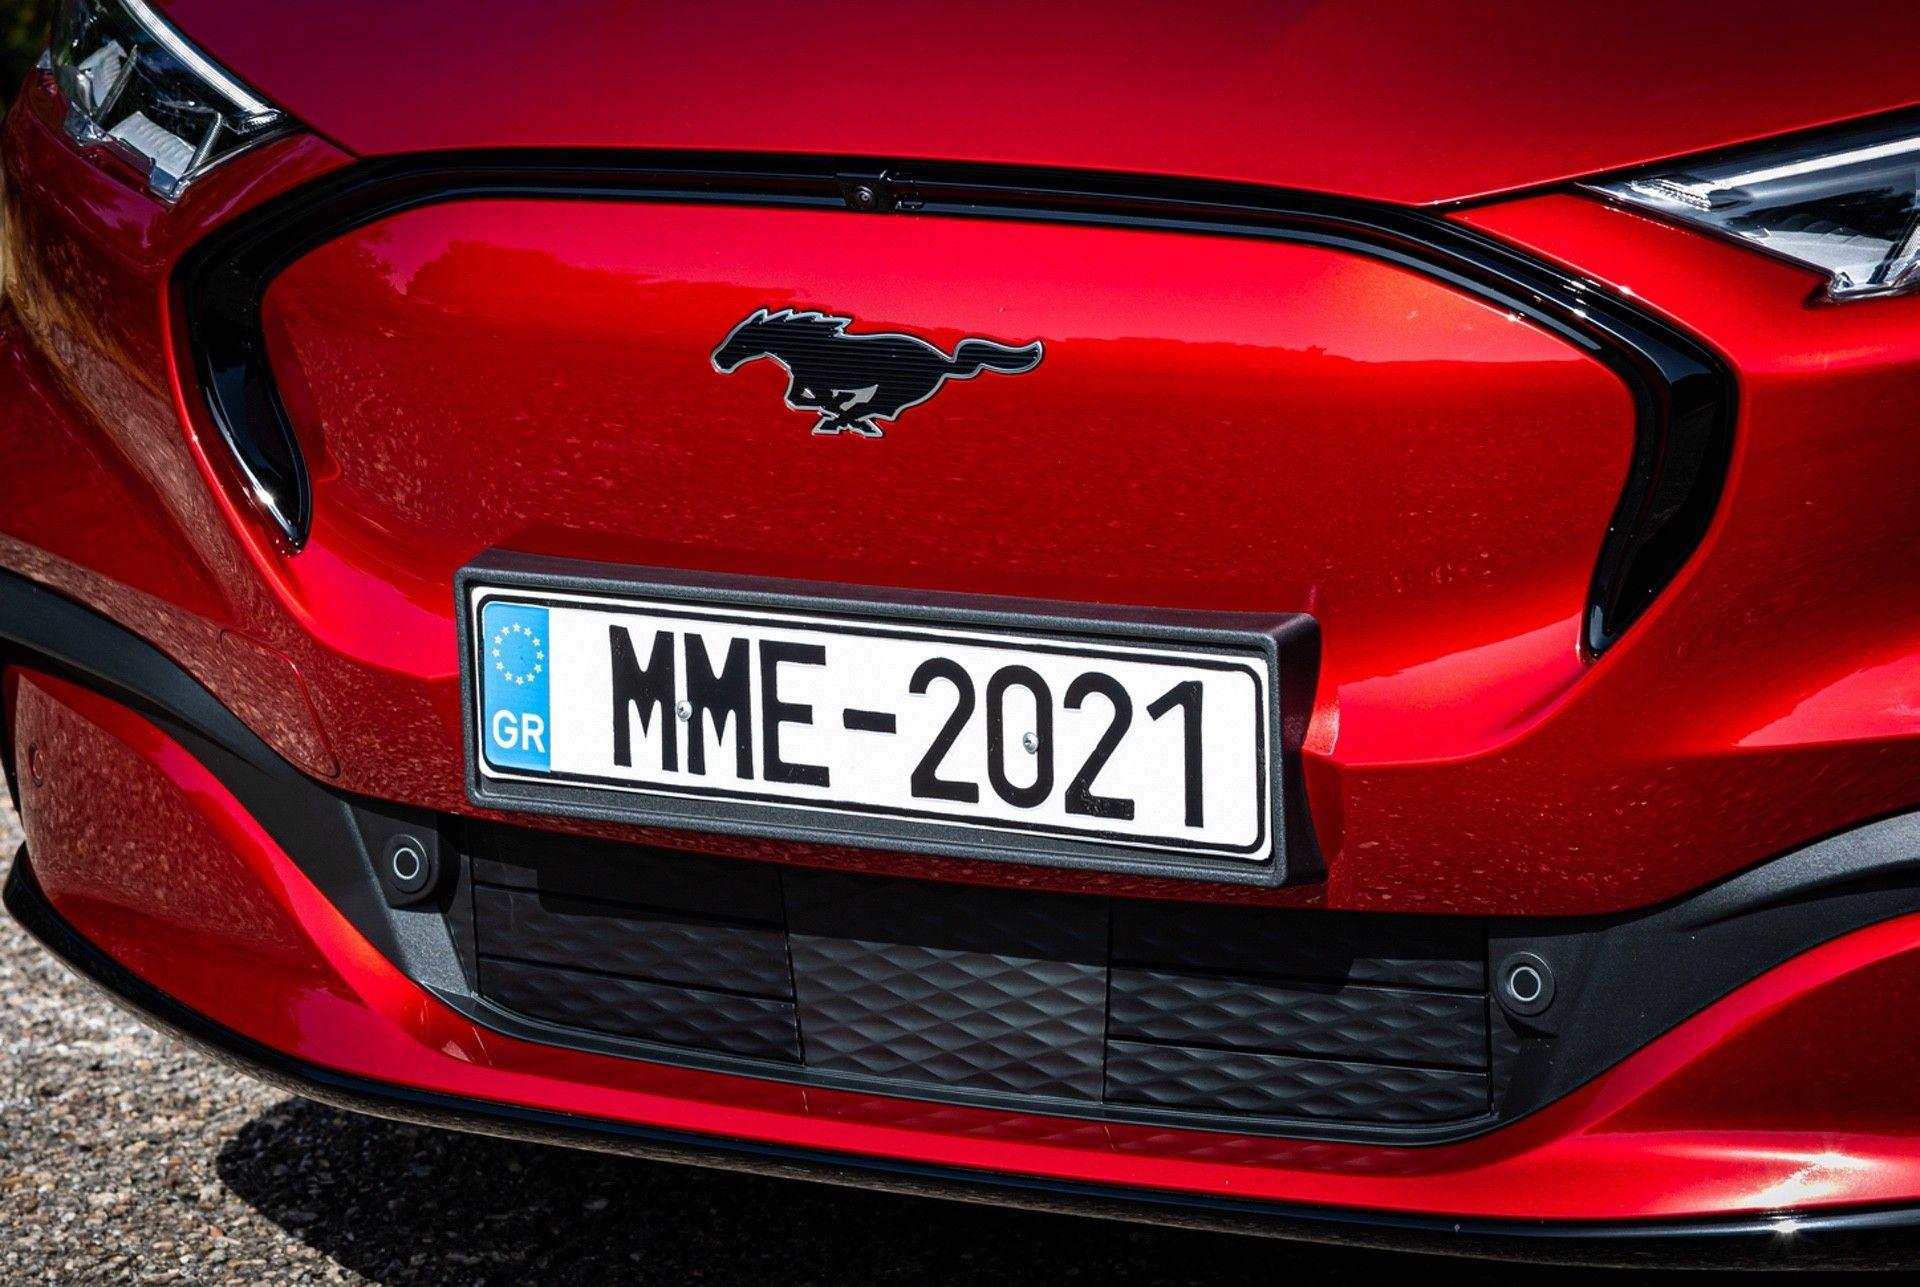 Ford_Mustang_Mach-E_greek_presskit-0171